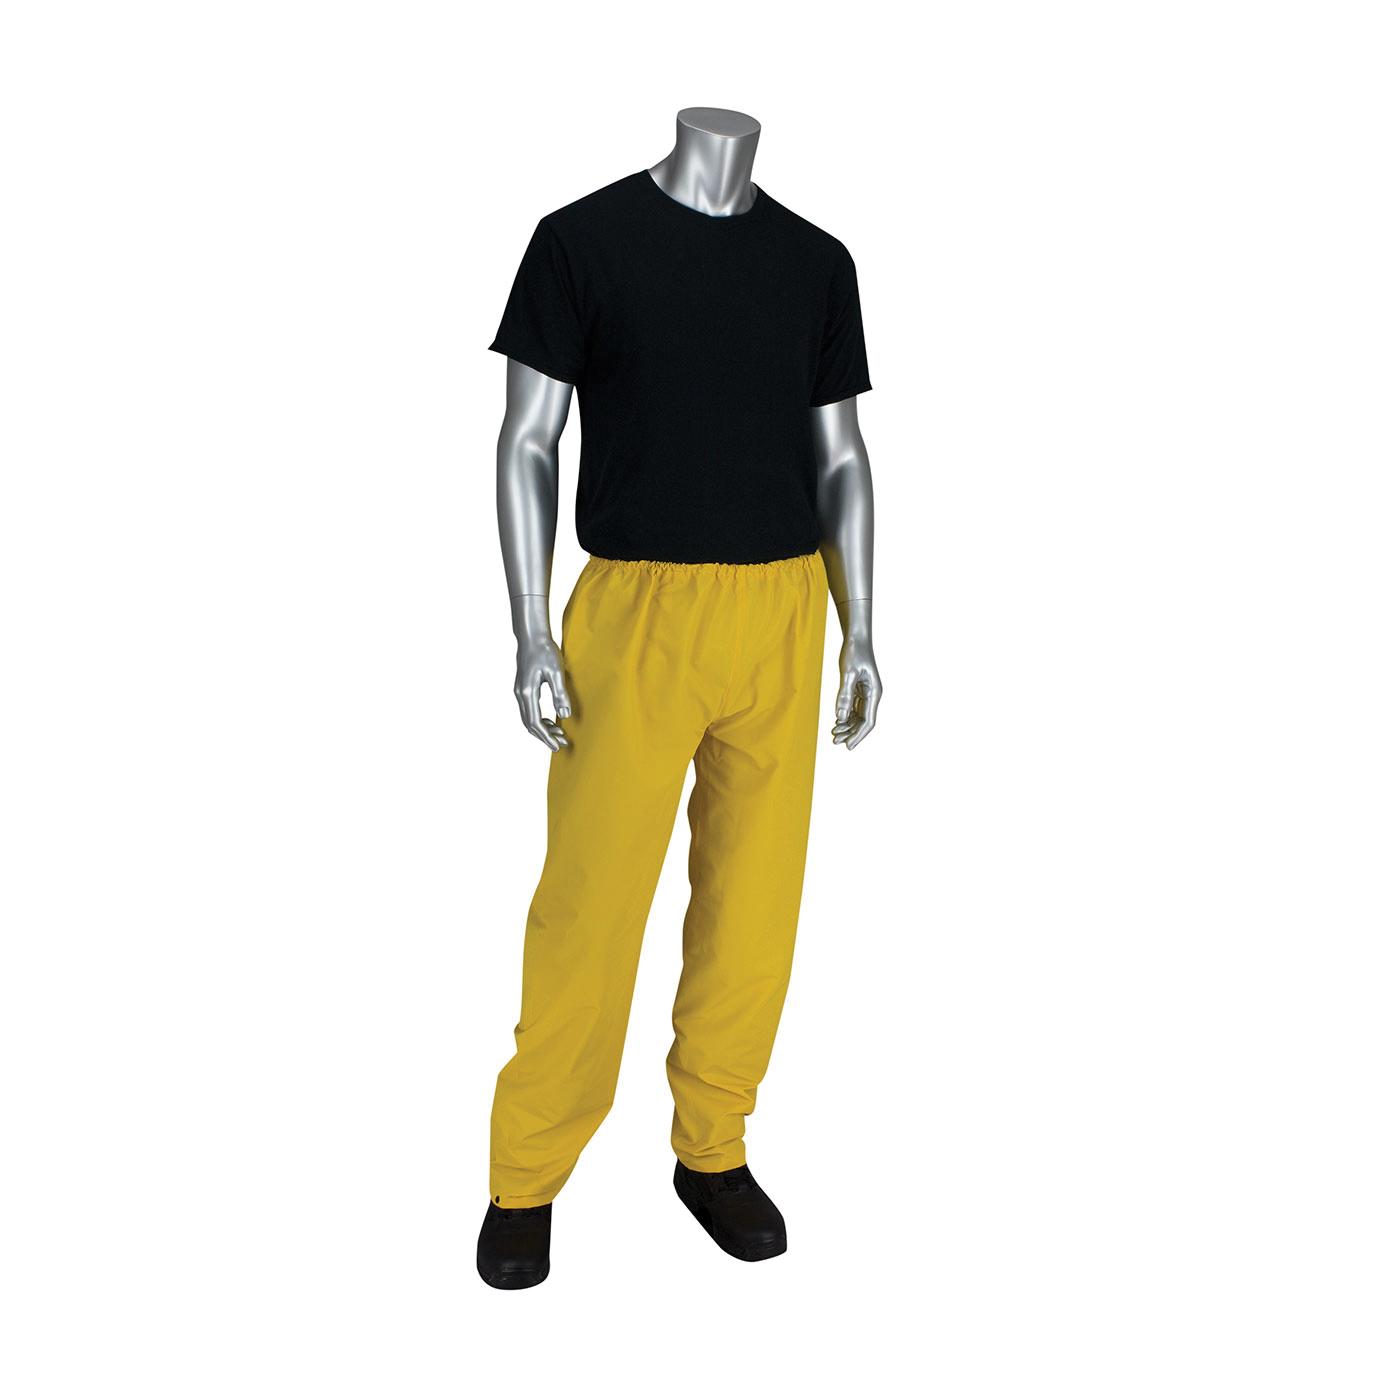 PIP® FALCON™ Base35™ 201-350P/2X Premium, 52 in Waist, 33 in L Inseam, Yellow, Polyester/PVC